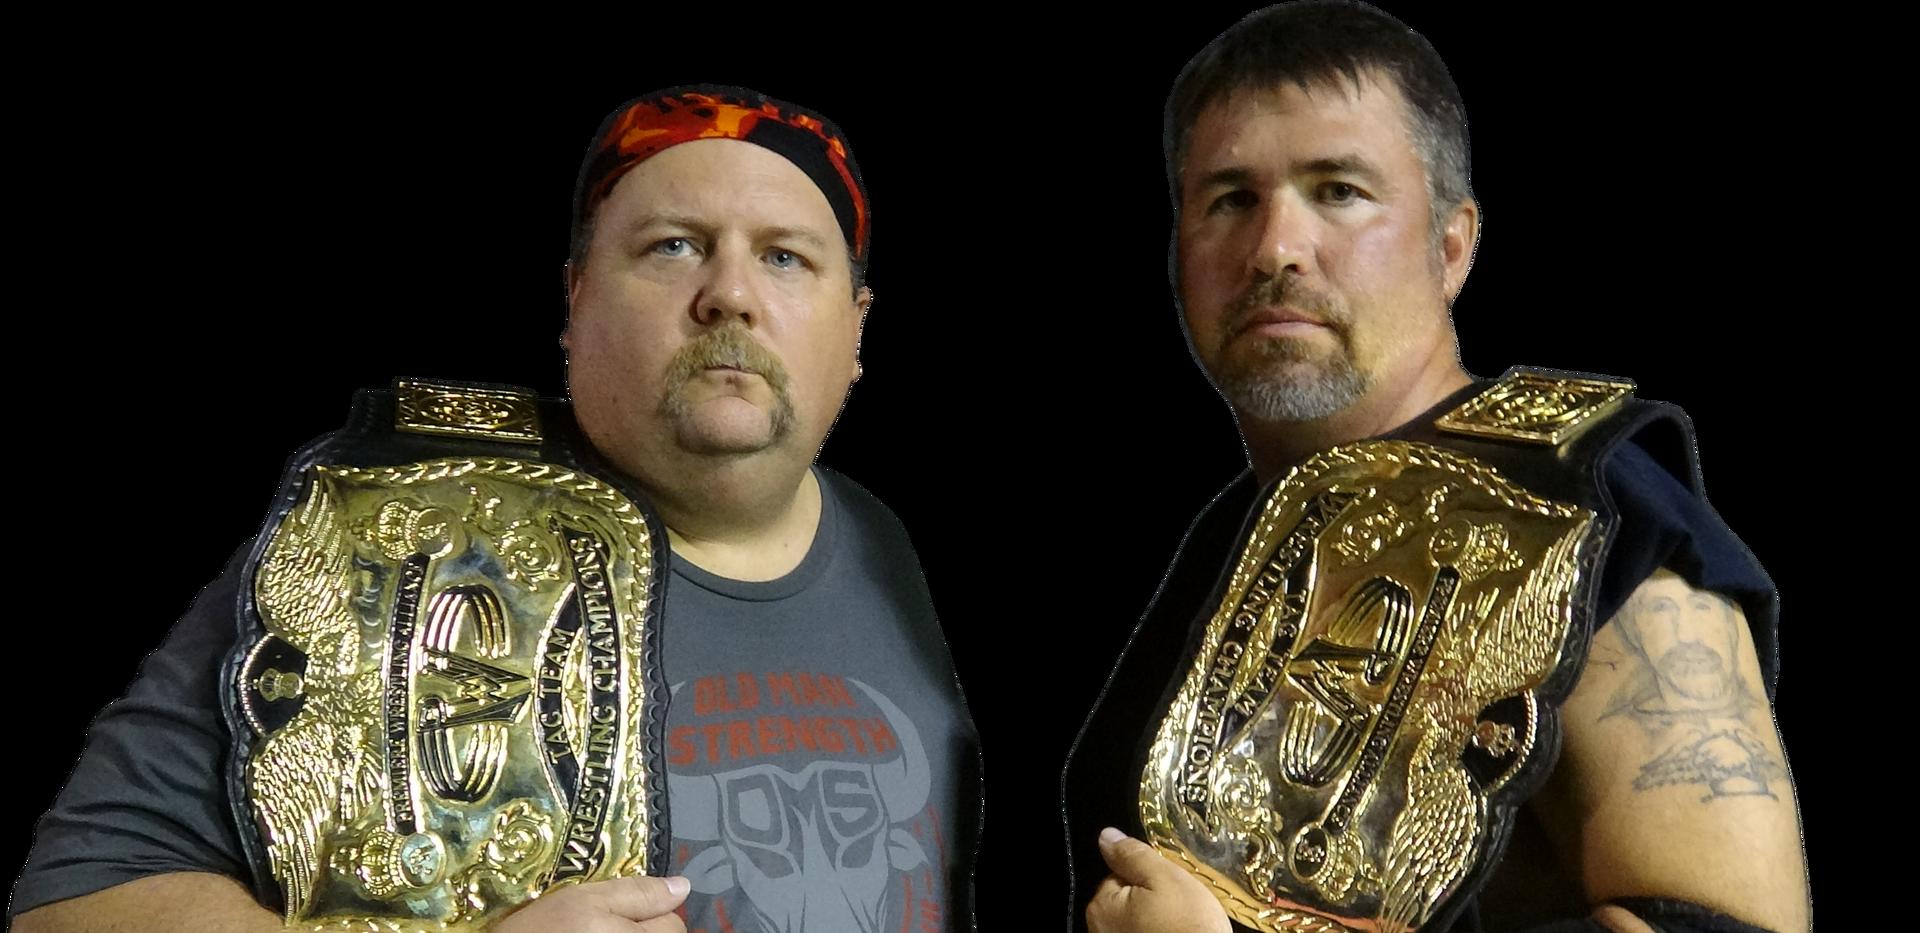 American Outlaws (Jim Daily & Bryan Blade) (x2)